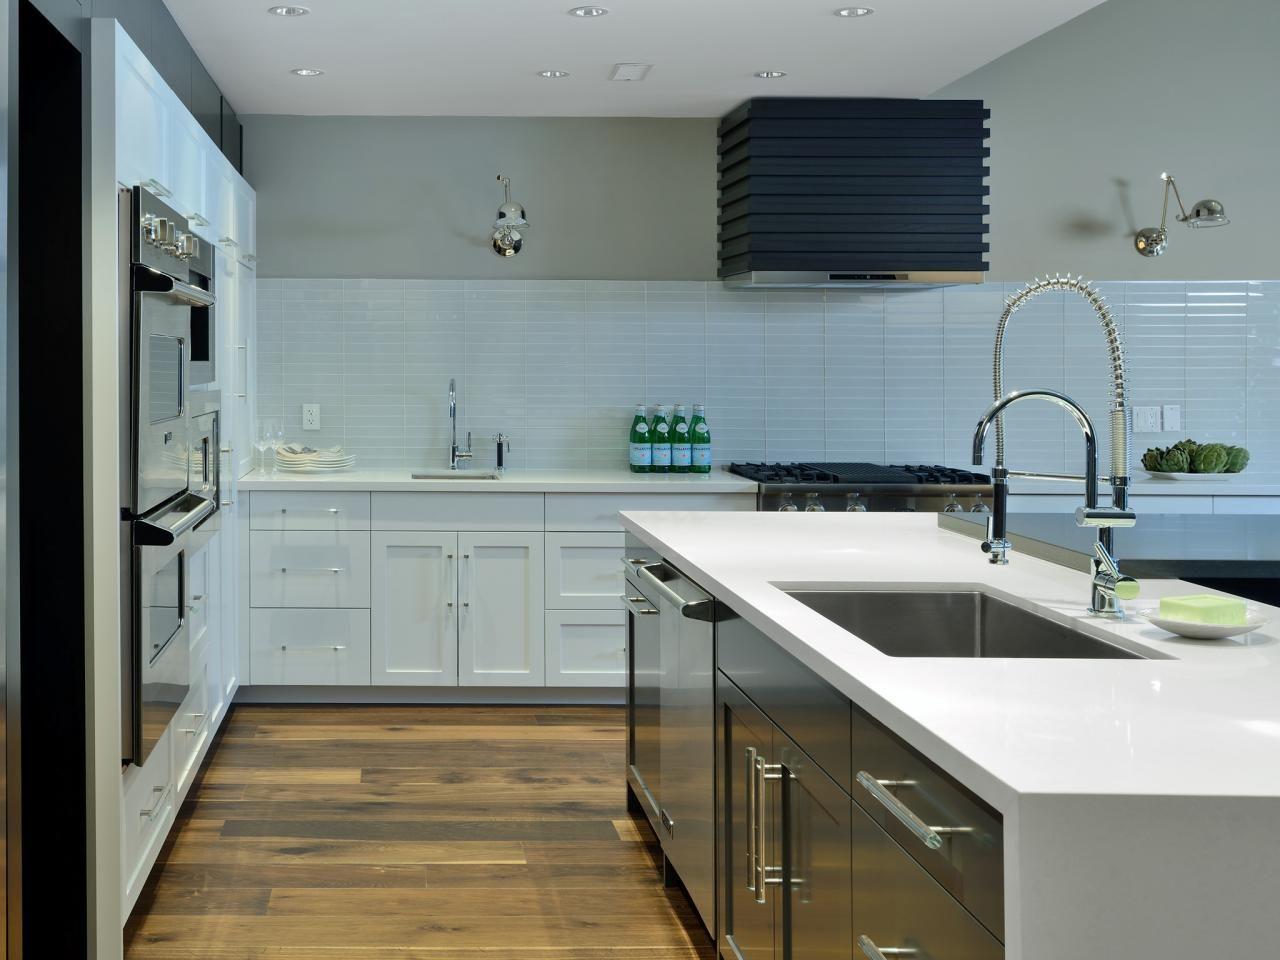 30 Trendiest Kitchen Backsplash Materials | Shed | Pinterest ...